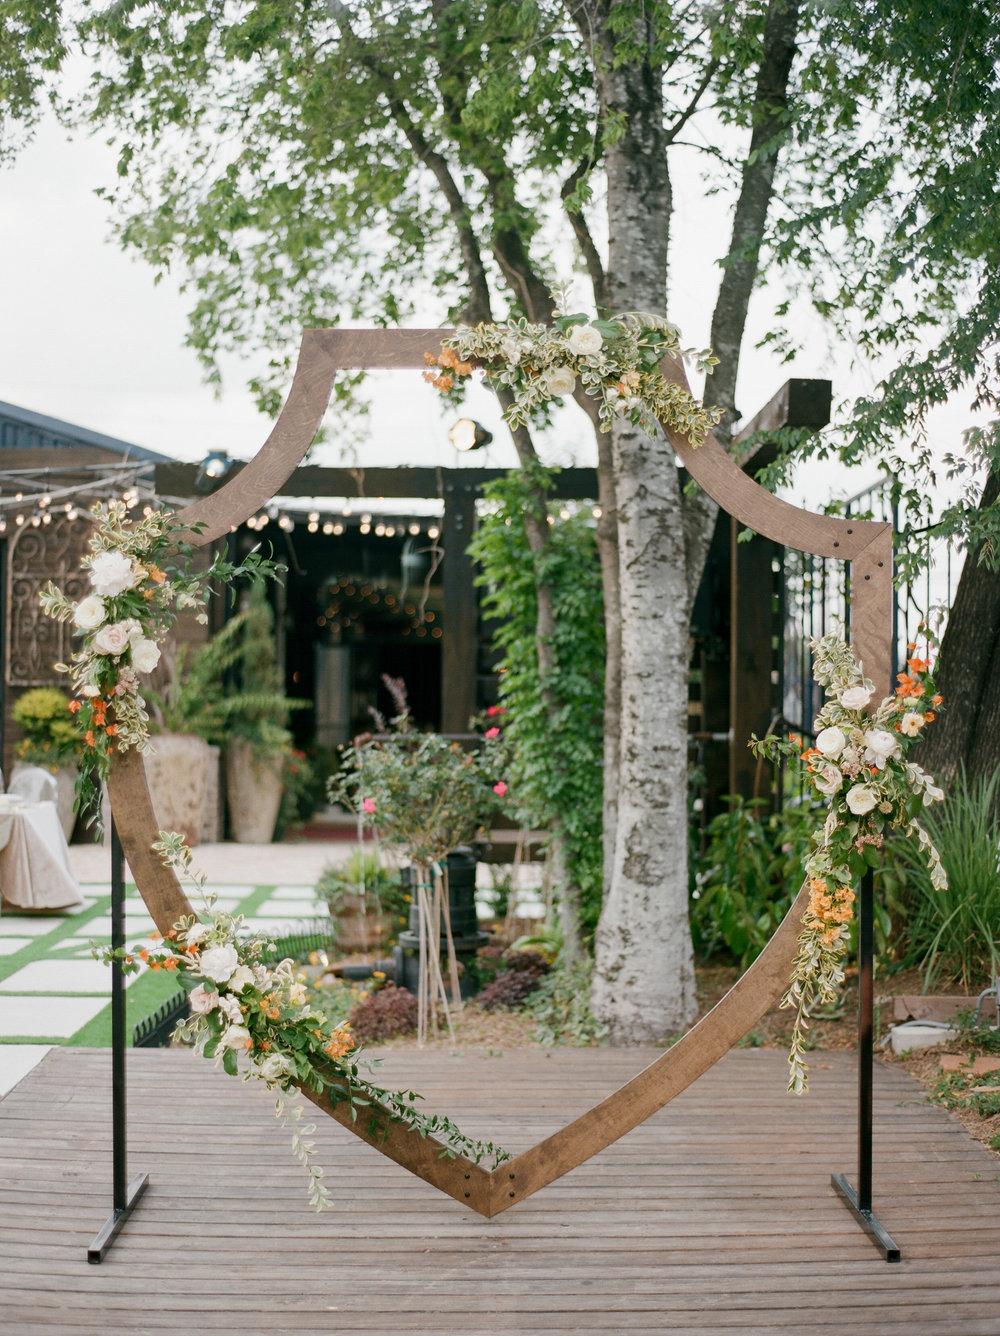 Houston-Wedding-Photographer-Fine-Art-Film-Destination-Style-Me-Pretty-Austin-Dallas-New-Orleans-Dana-Fernandez-Photography-5.jpg